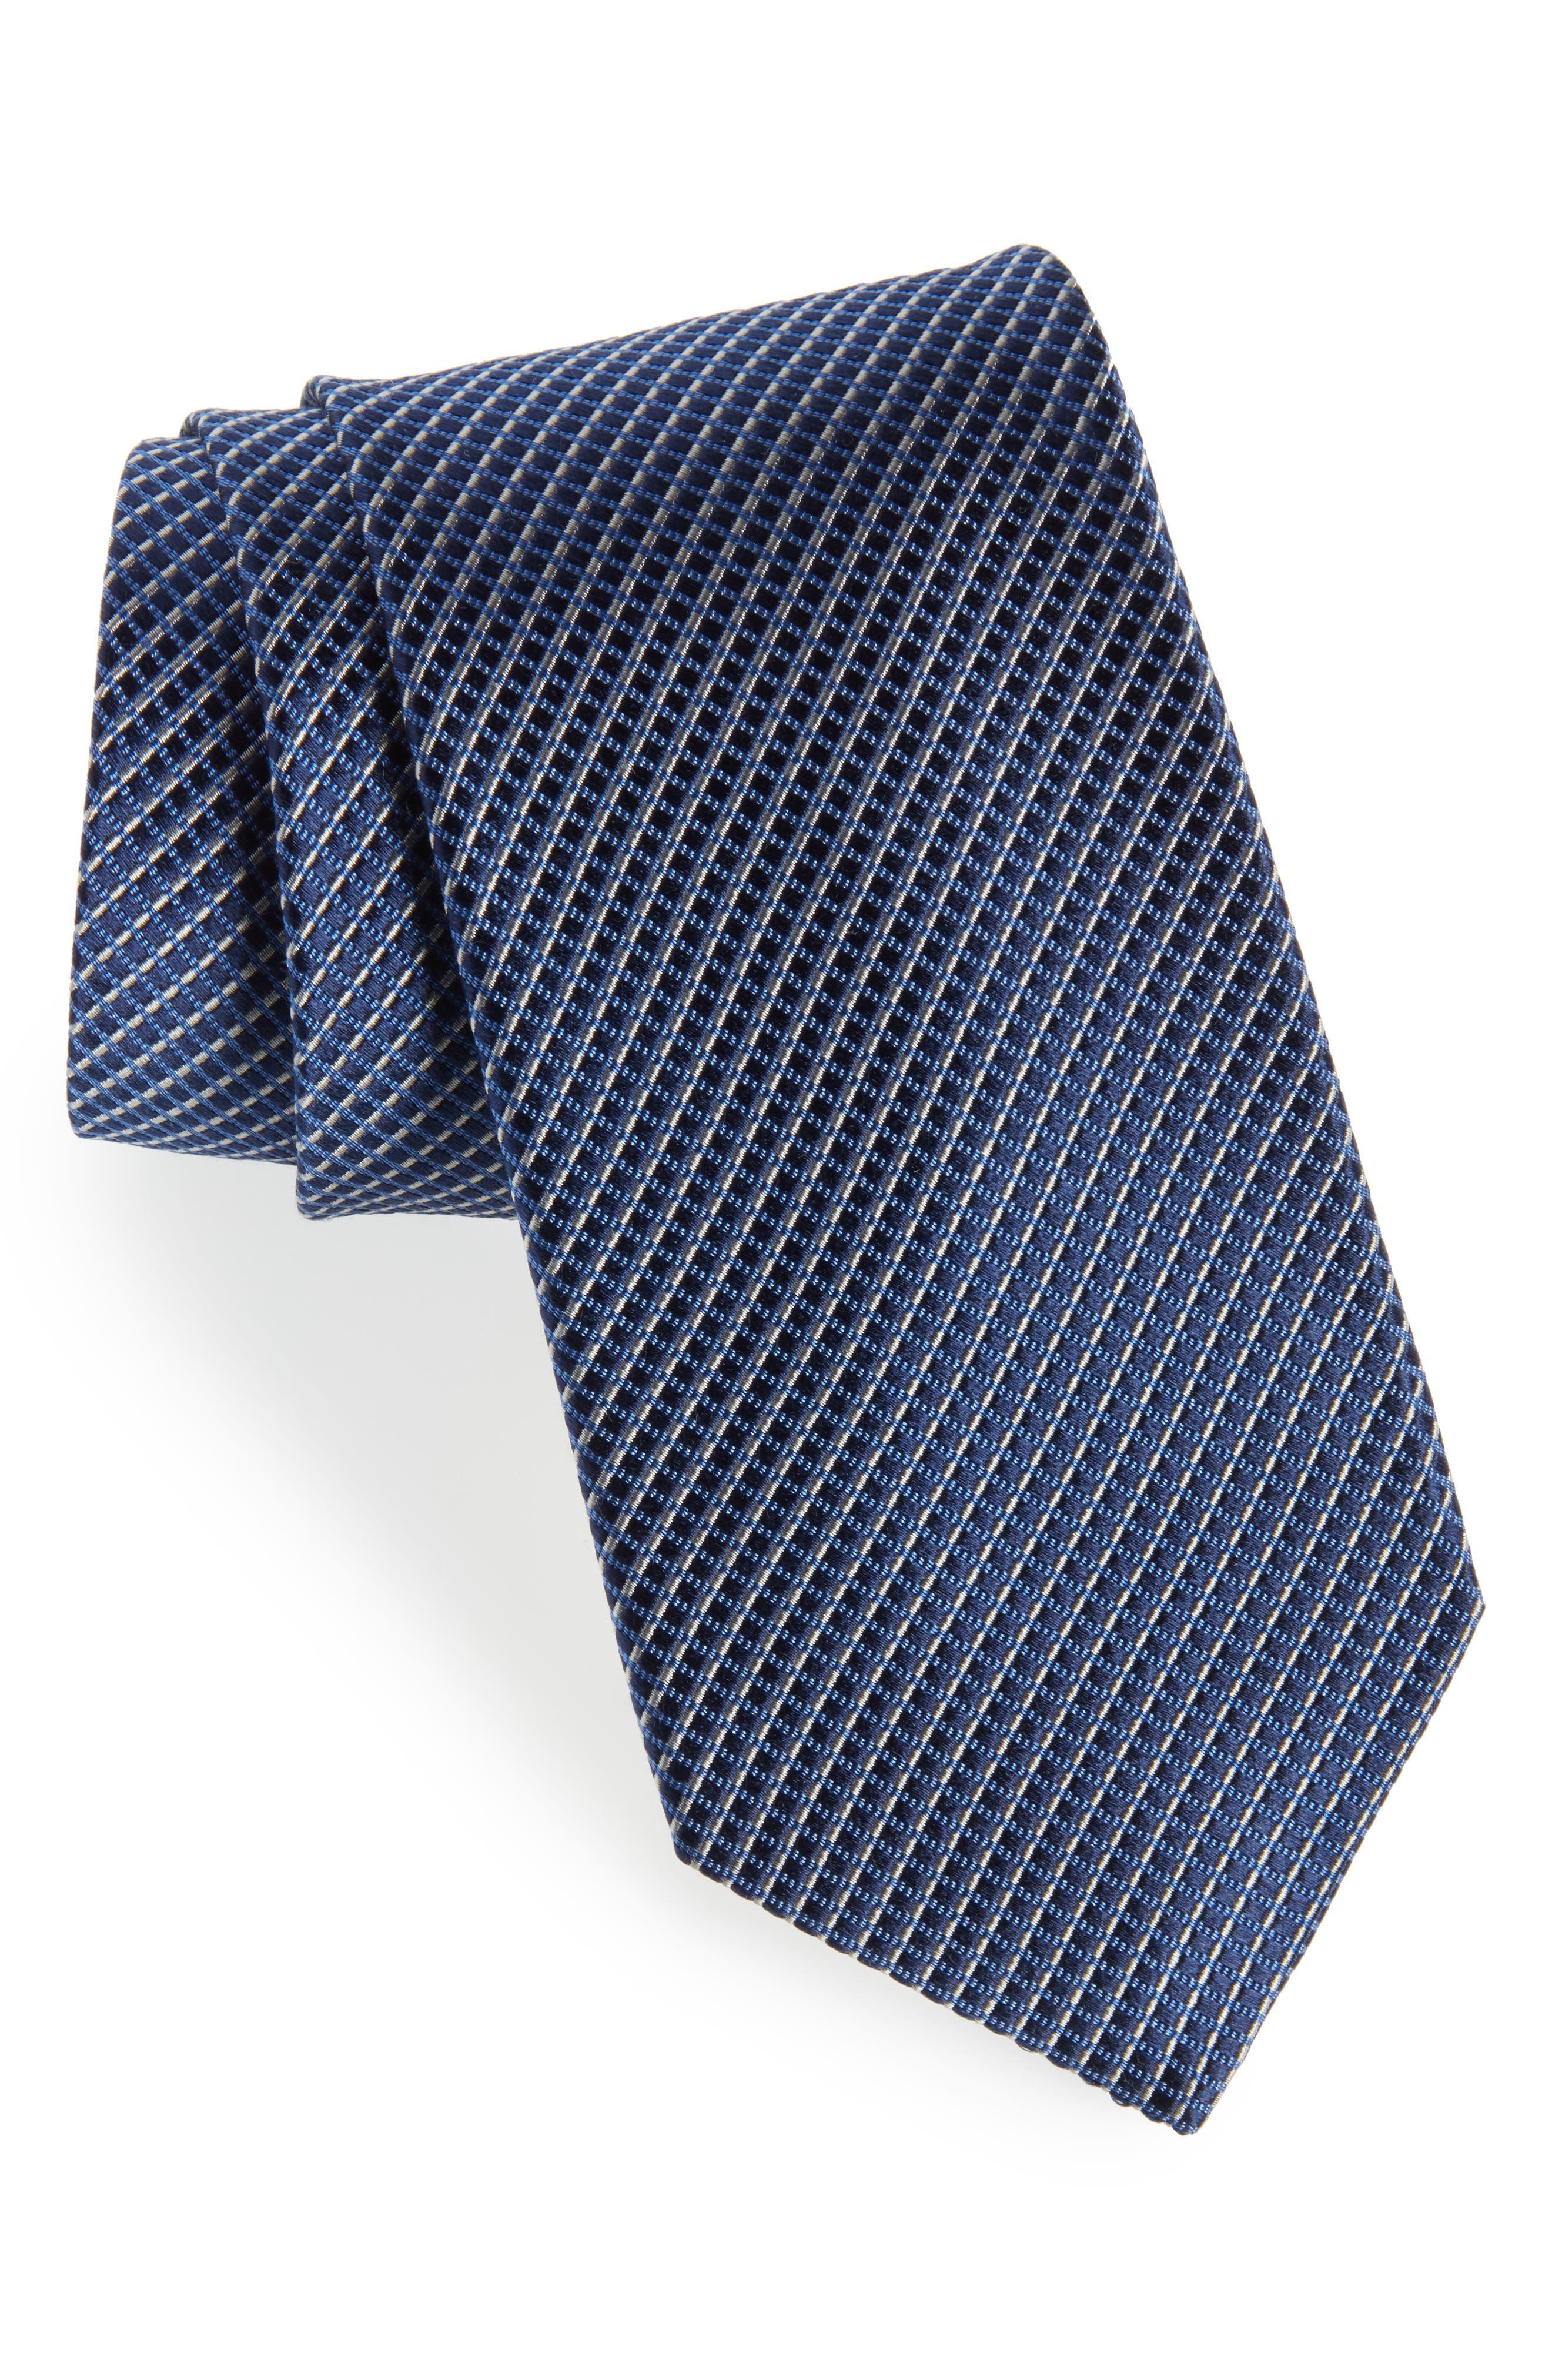 Bucaro Micro Pattern Silk Tie,                             Main thumbnail 1, color,                             NAVY